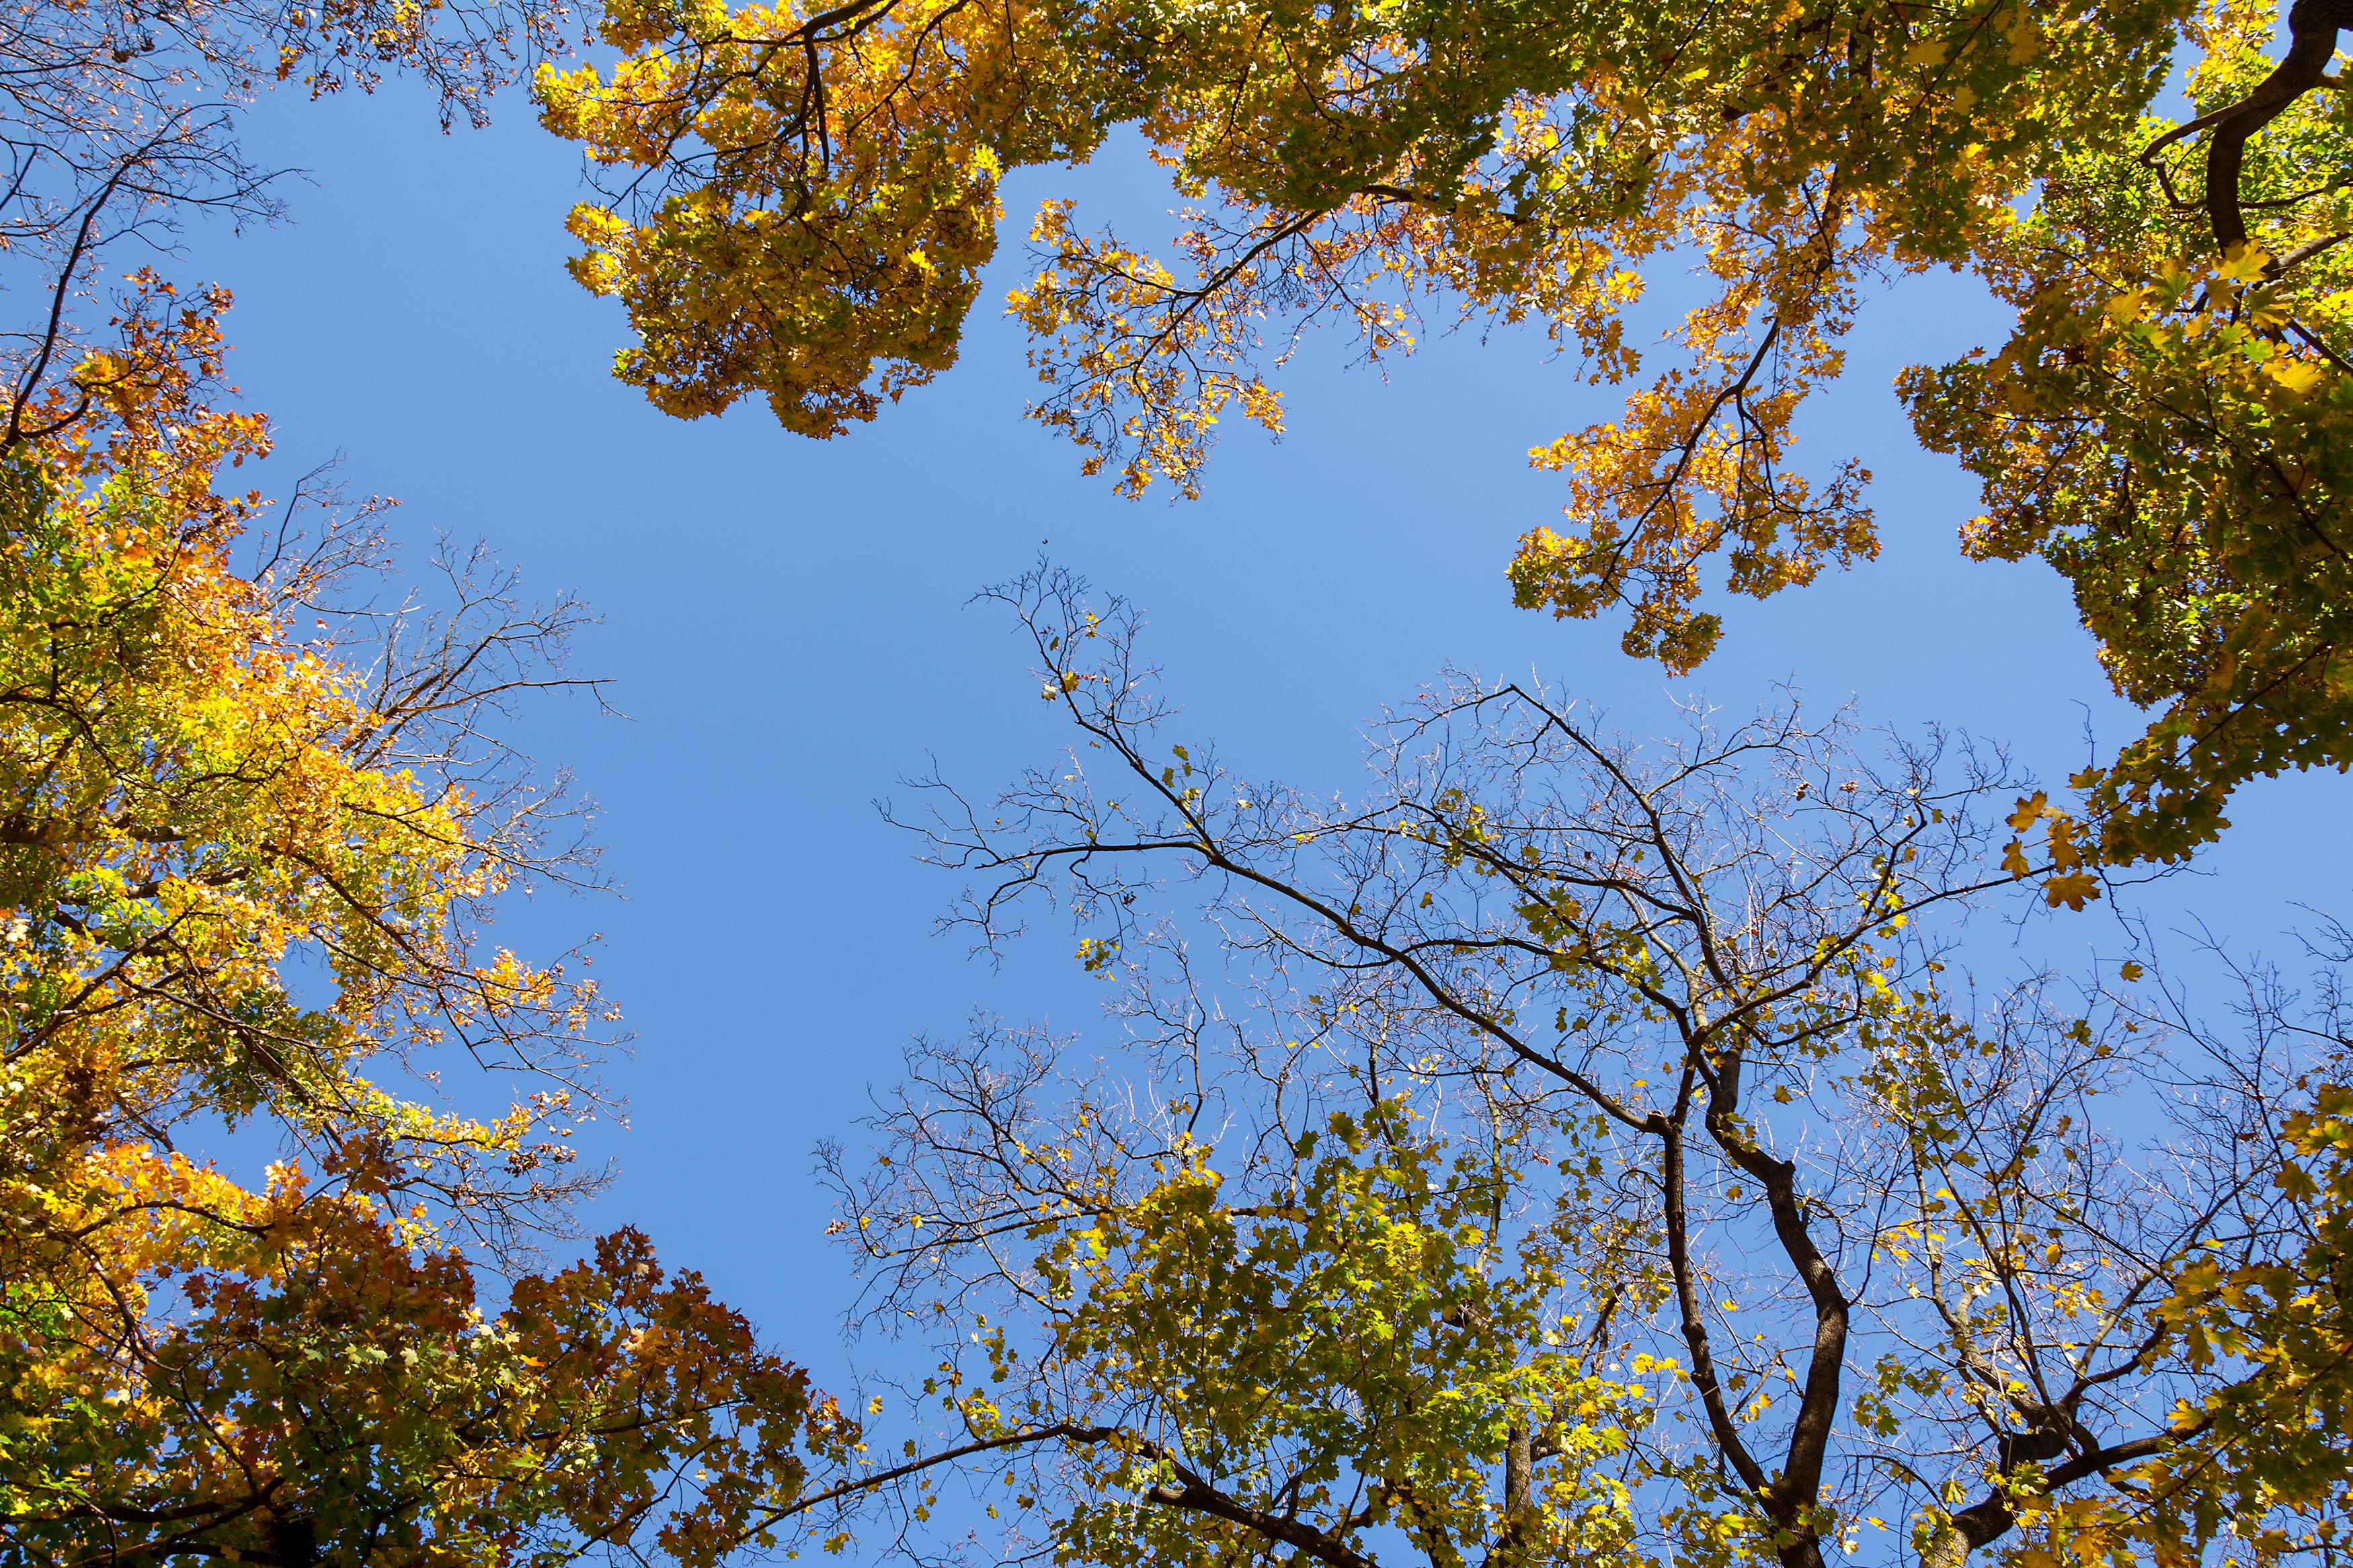 Free Image: Autumn Tree Crowns   Libreshot Public Domain Photos